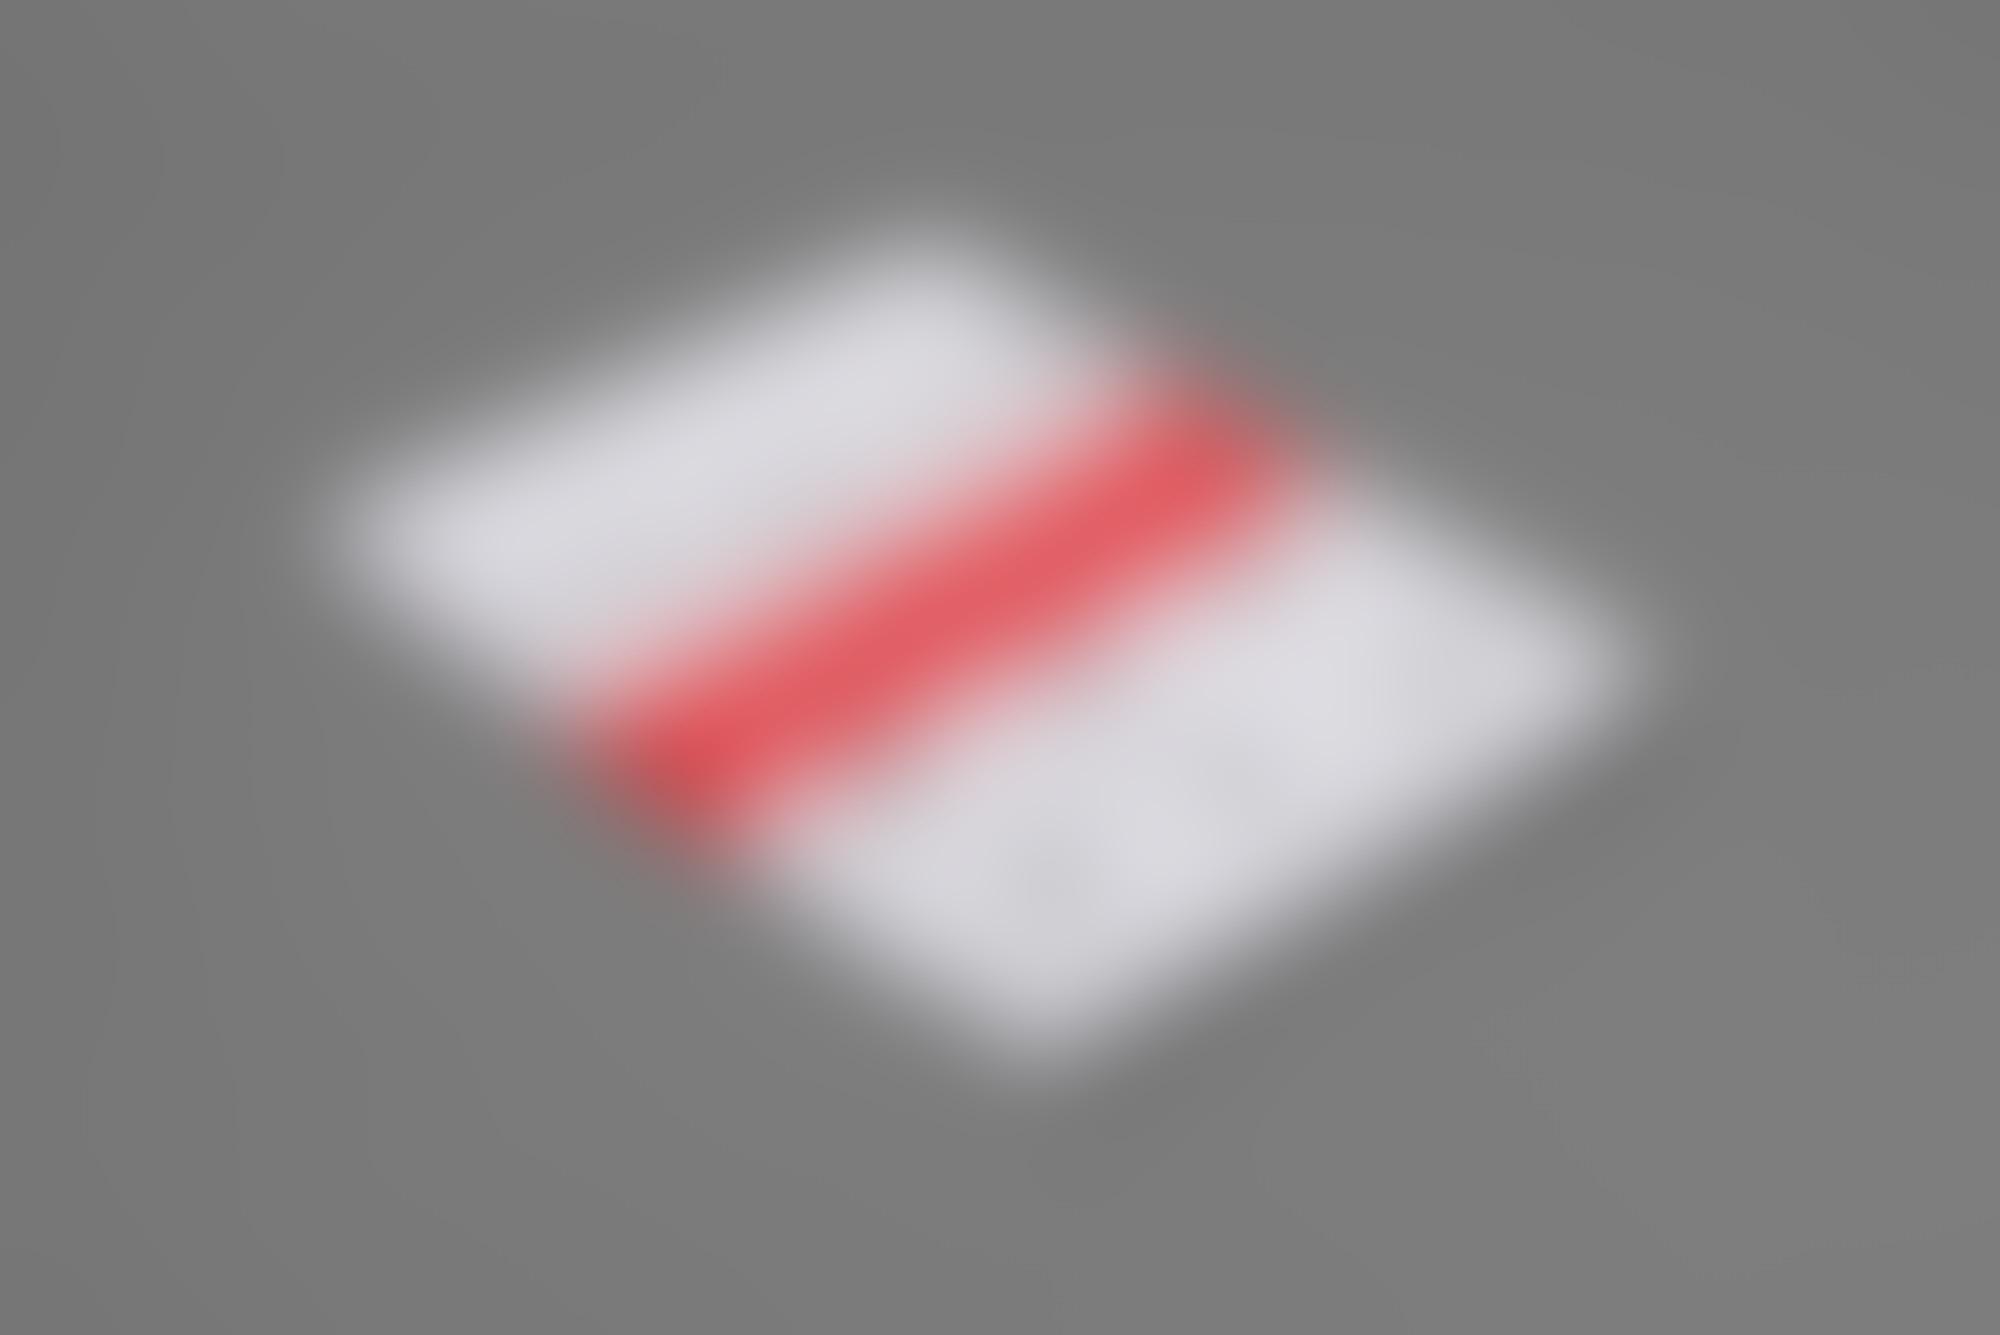 Avaunt 3 autocompressfitresizeixlibphp 1 1 0max h2000max w3 D2000q80s3717a6b4221416676a1870dae5df700a